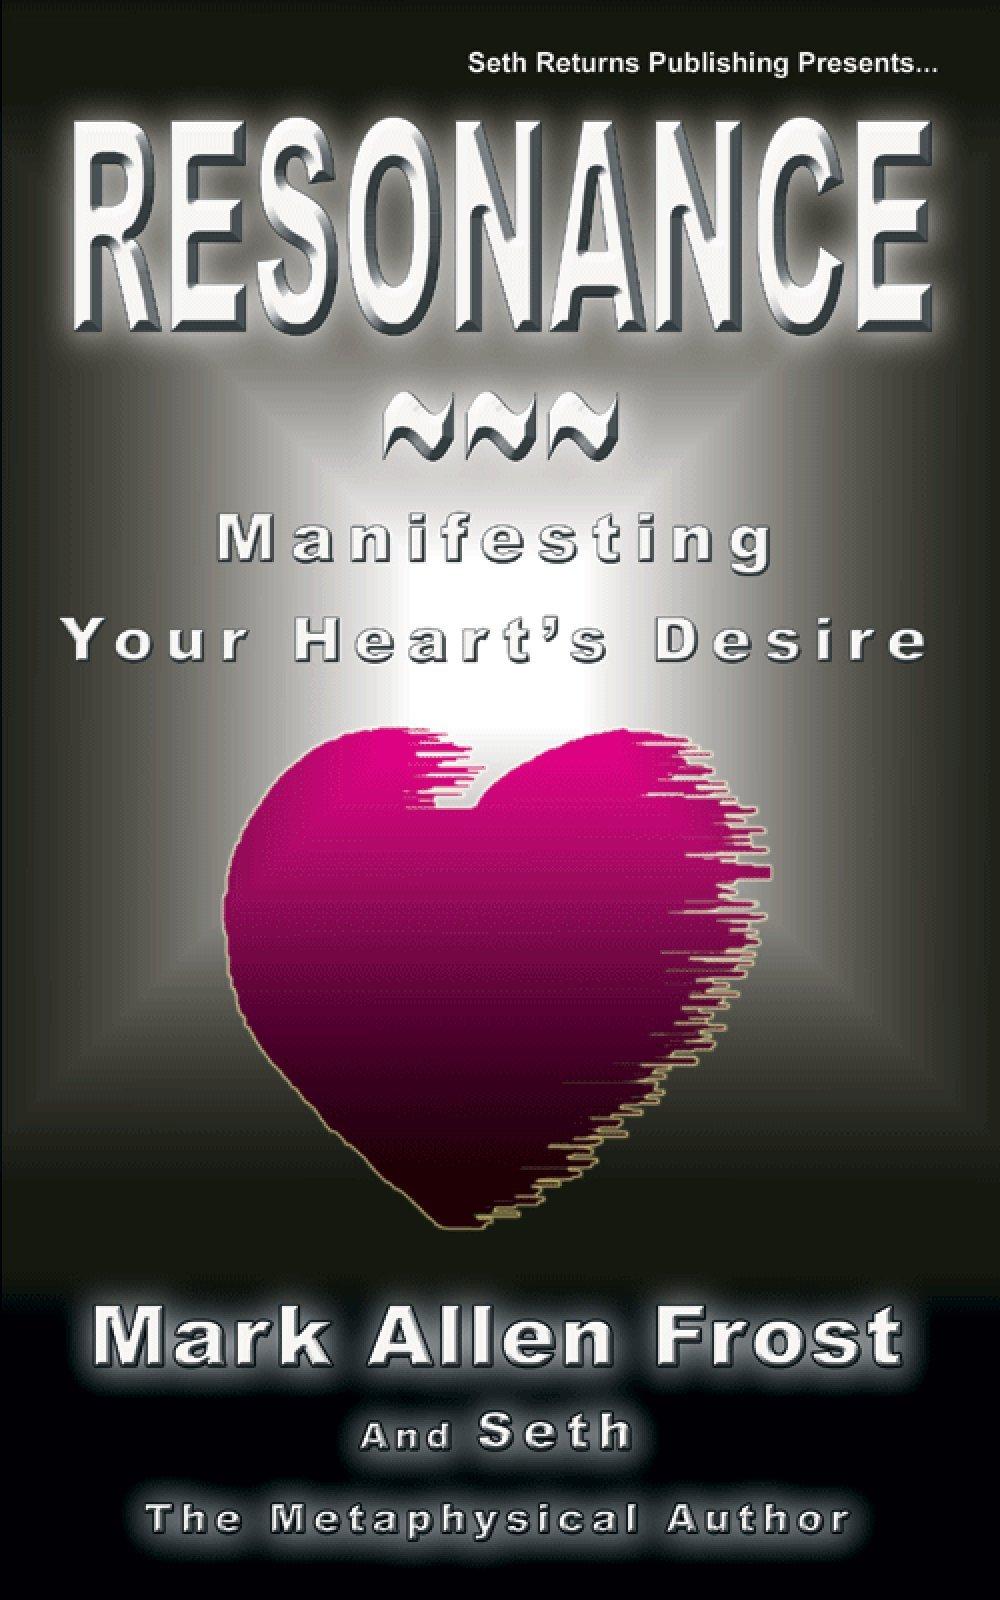 Resonance - Manifesting Your Heart's Desire PDF